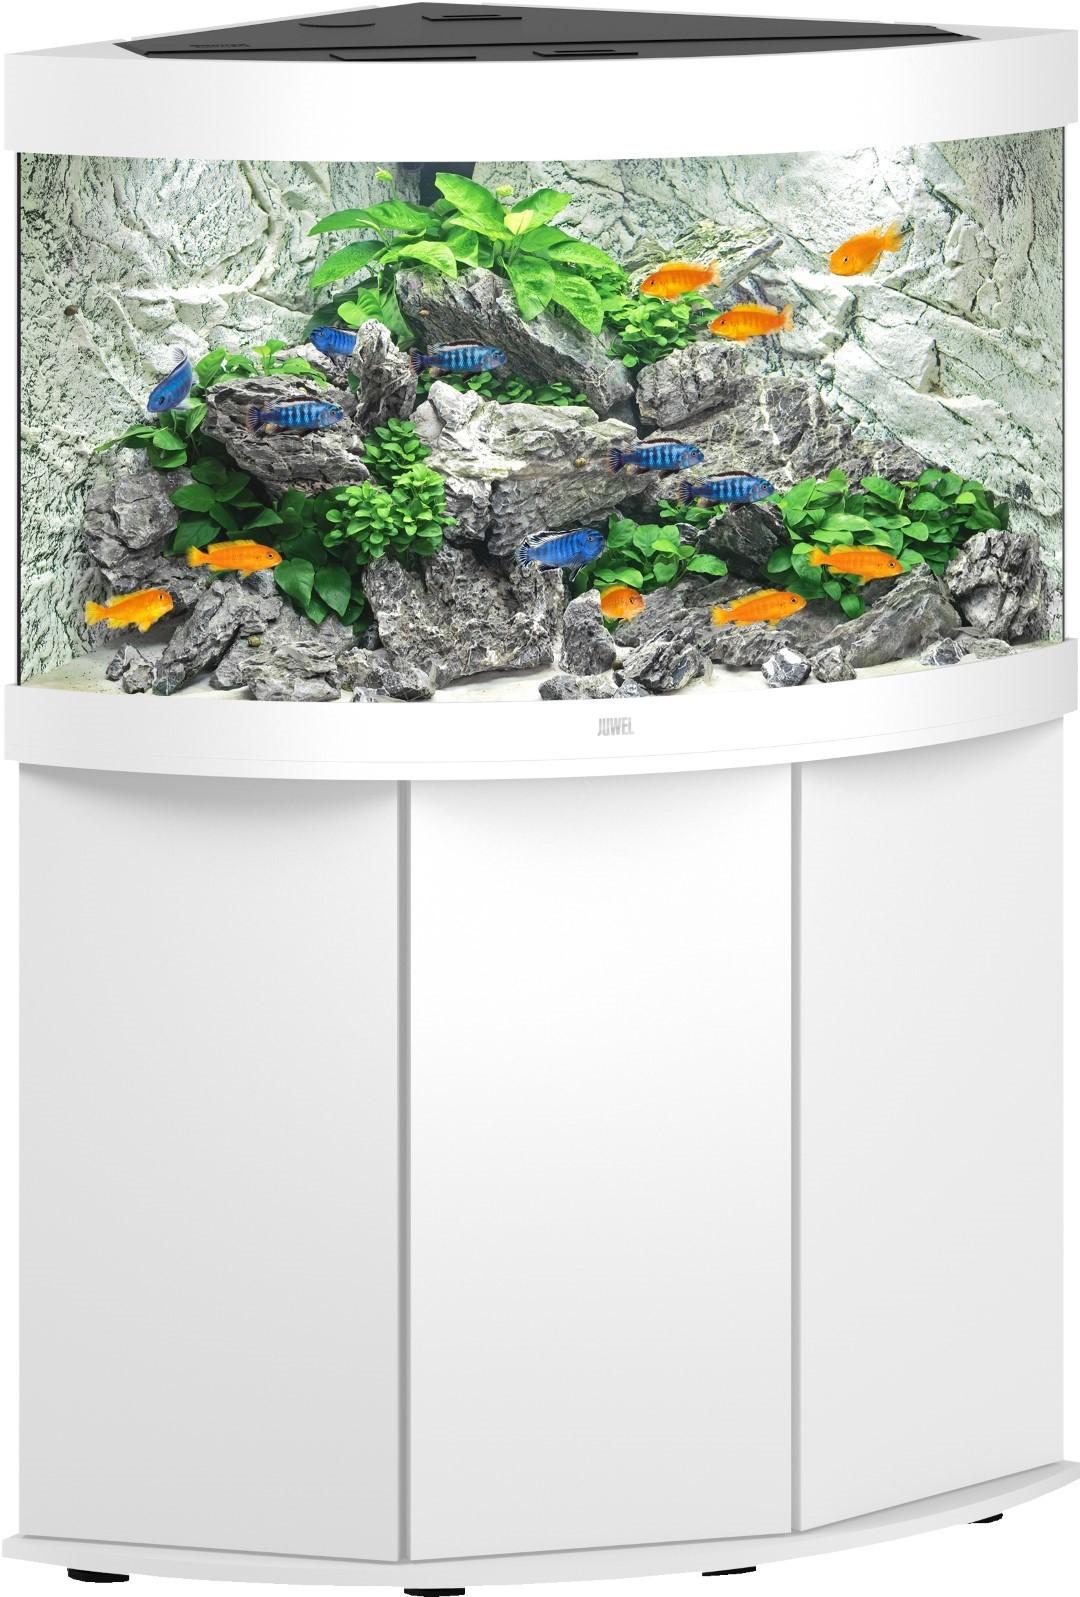 Juwel aquarium Trigon 190 LED met filter wit